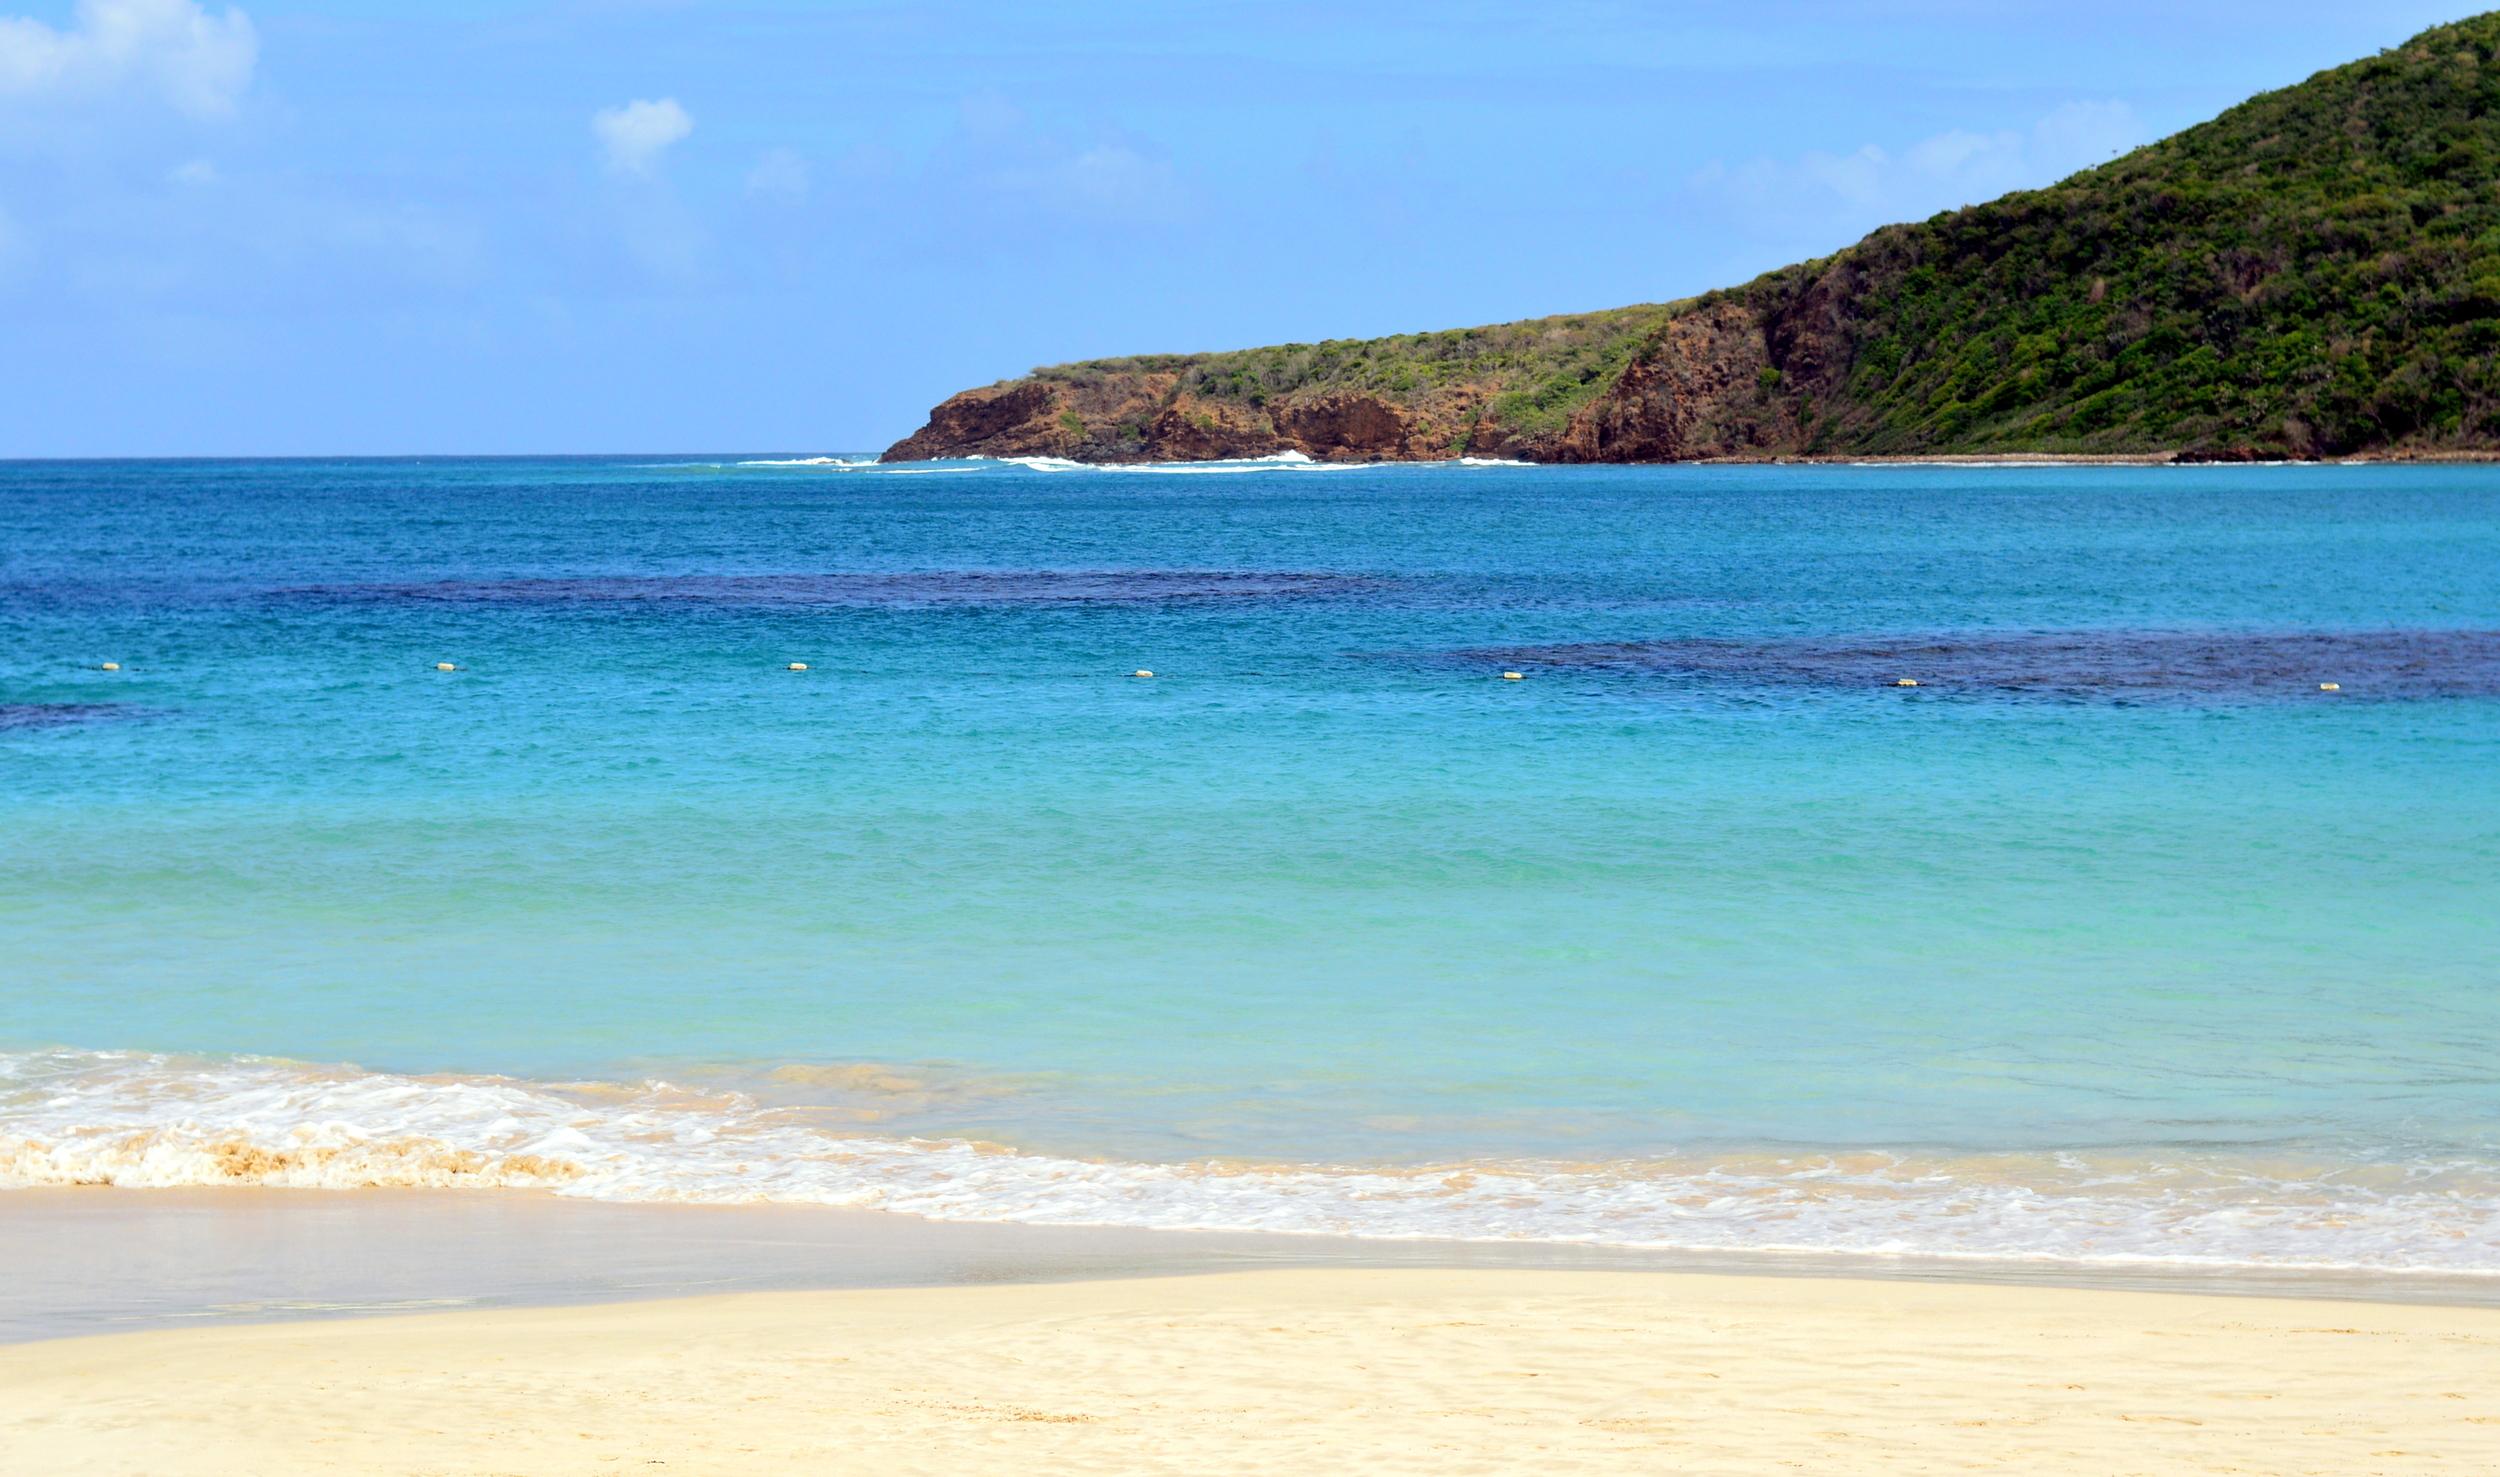 flamenco-beach-culebra-puerto-rico-travel-guide